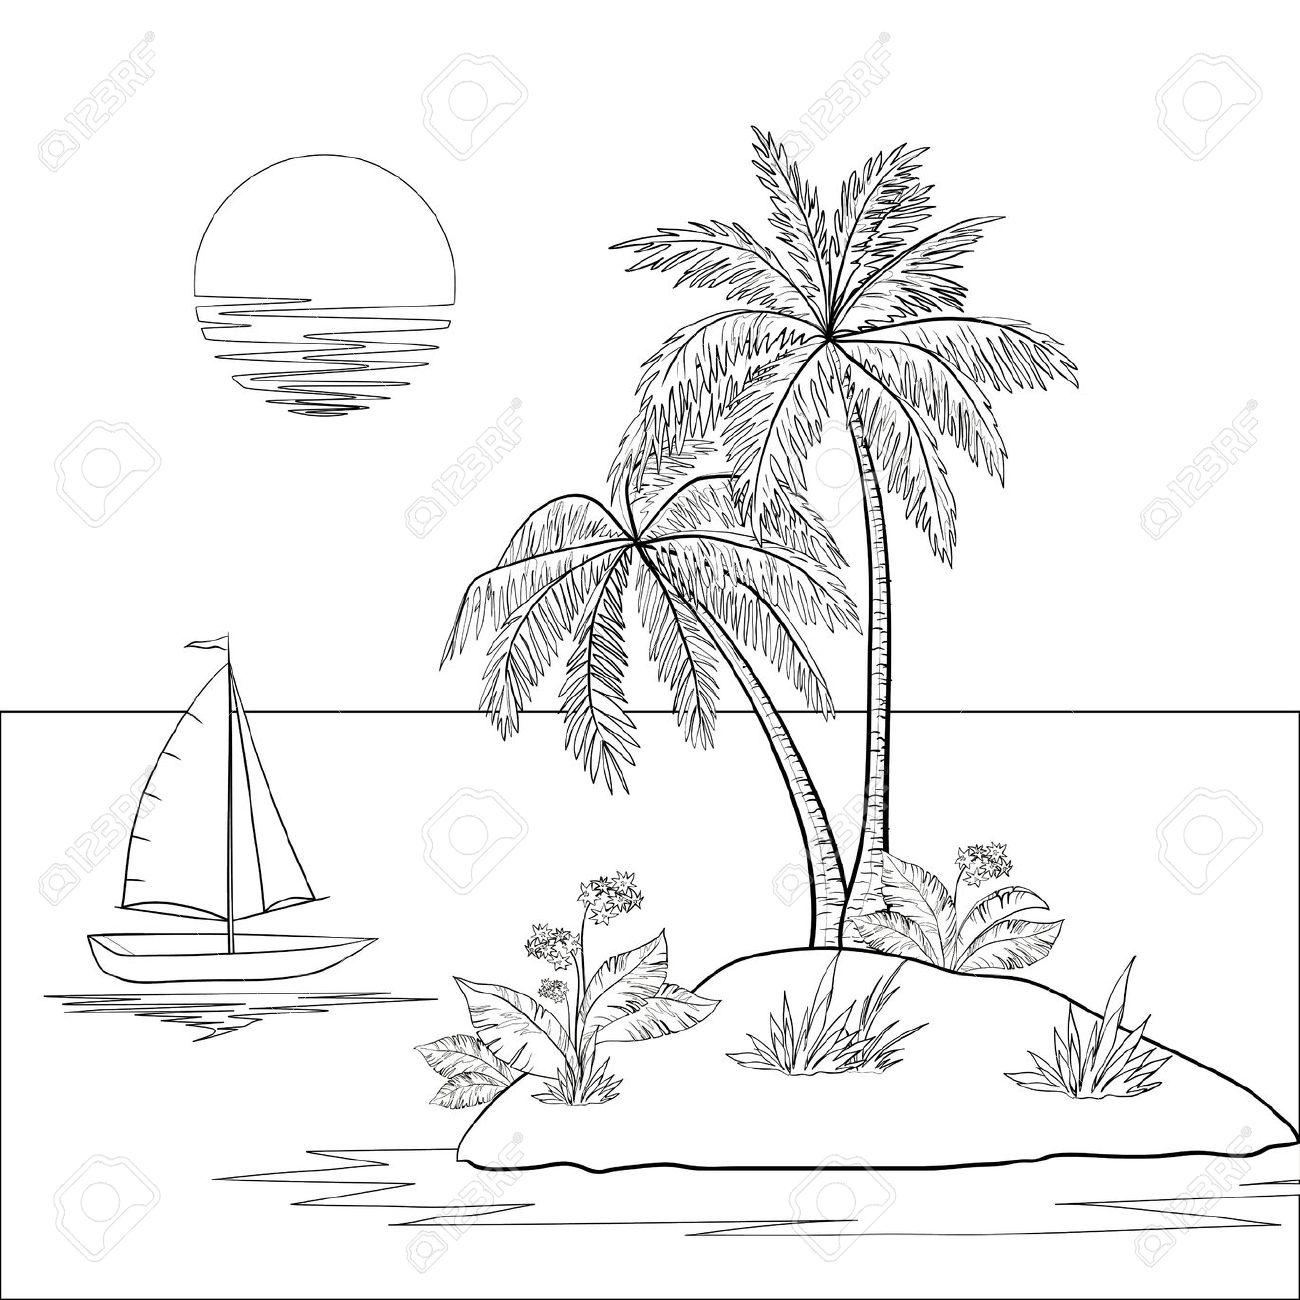 1300x1300 Ship, Sun, Tropical Sea Island With Palm Trees And Flowers Black